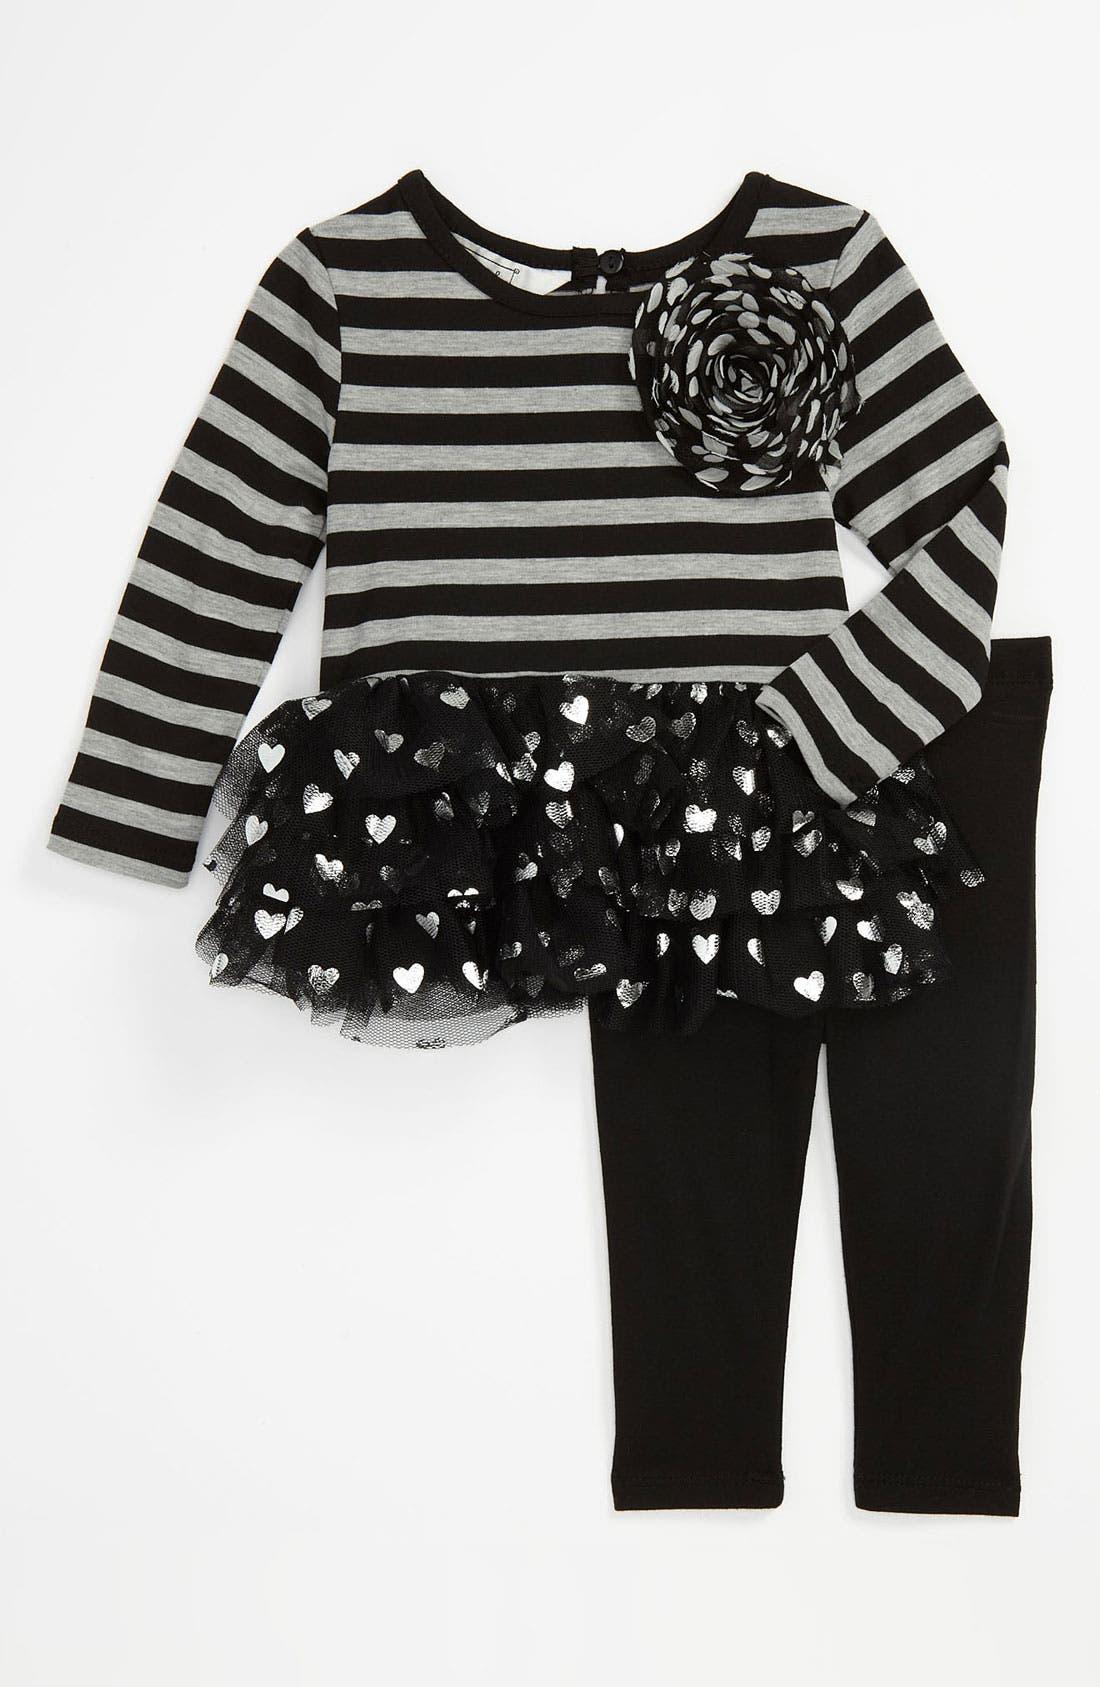 Alternate Image 1 Selected - Pippa & Julie Stripe Top & Leggings (Infant)